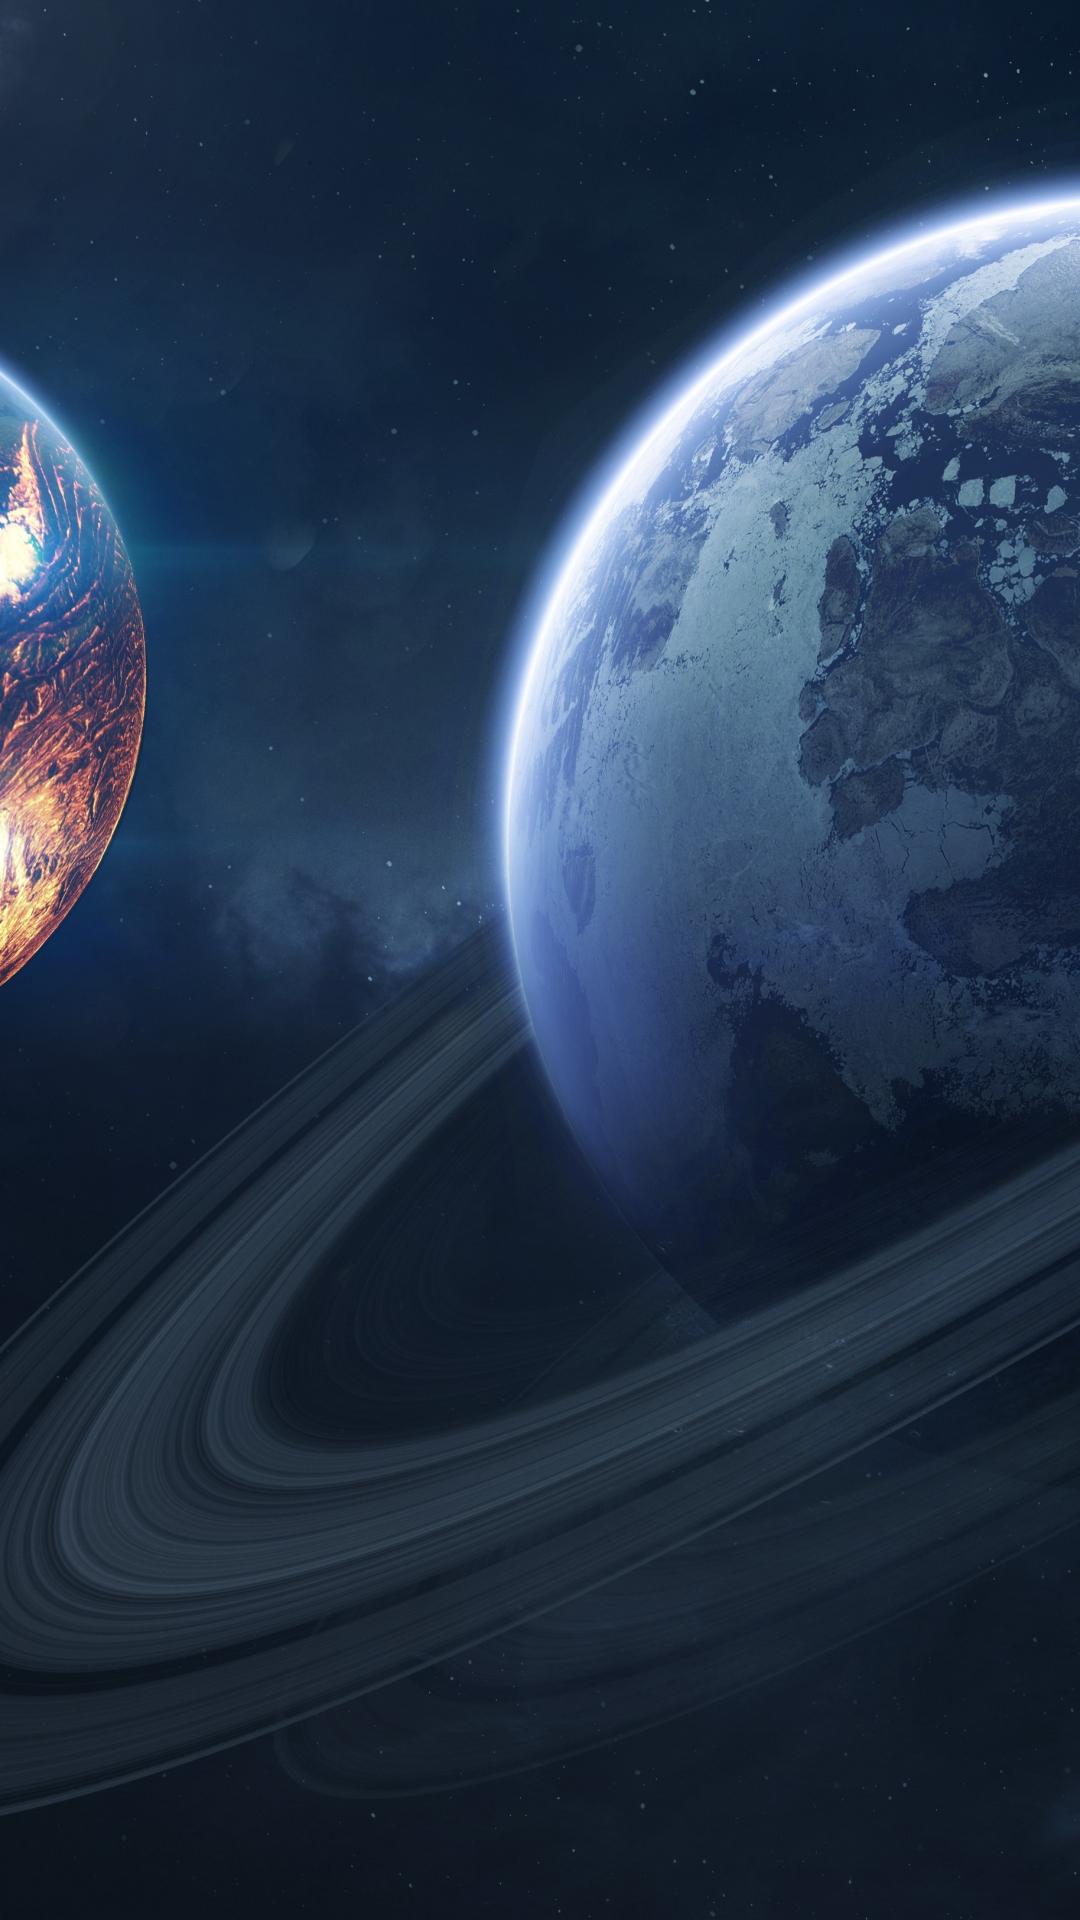 Saturn, space, planet of rings, 1080x1920 wallpaper